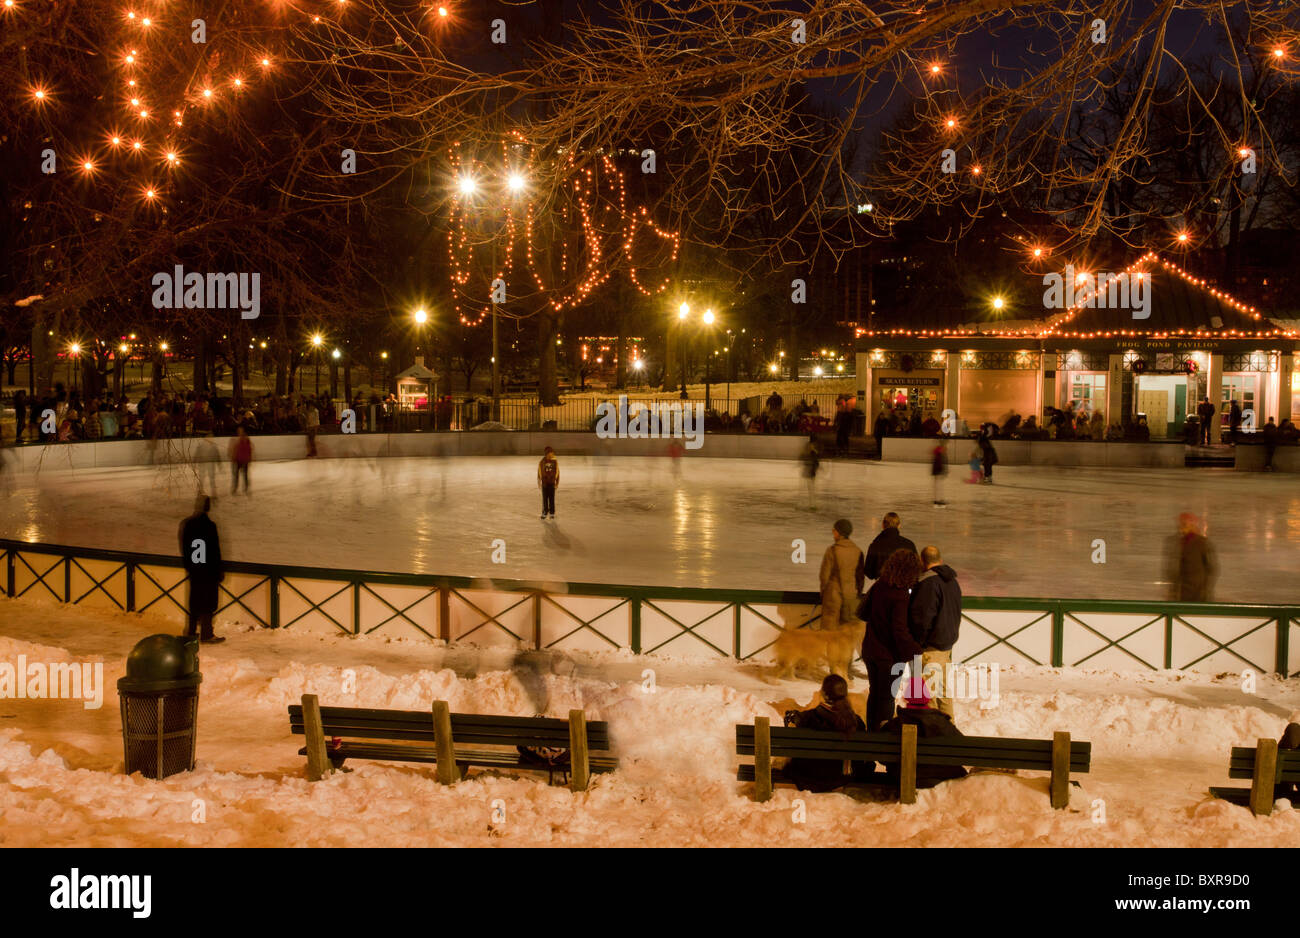 Christmas In Boston Massachusetts.Christmas Skating Rink On Frog Pond The Common Boston Ma